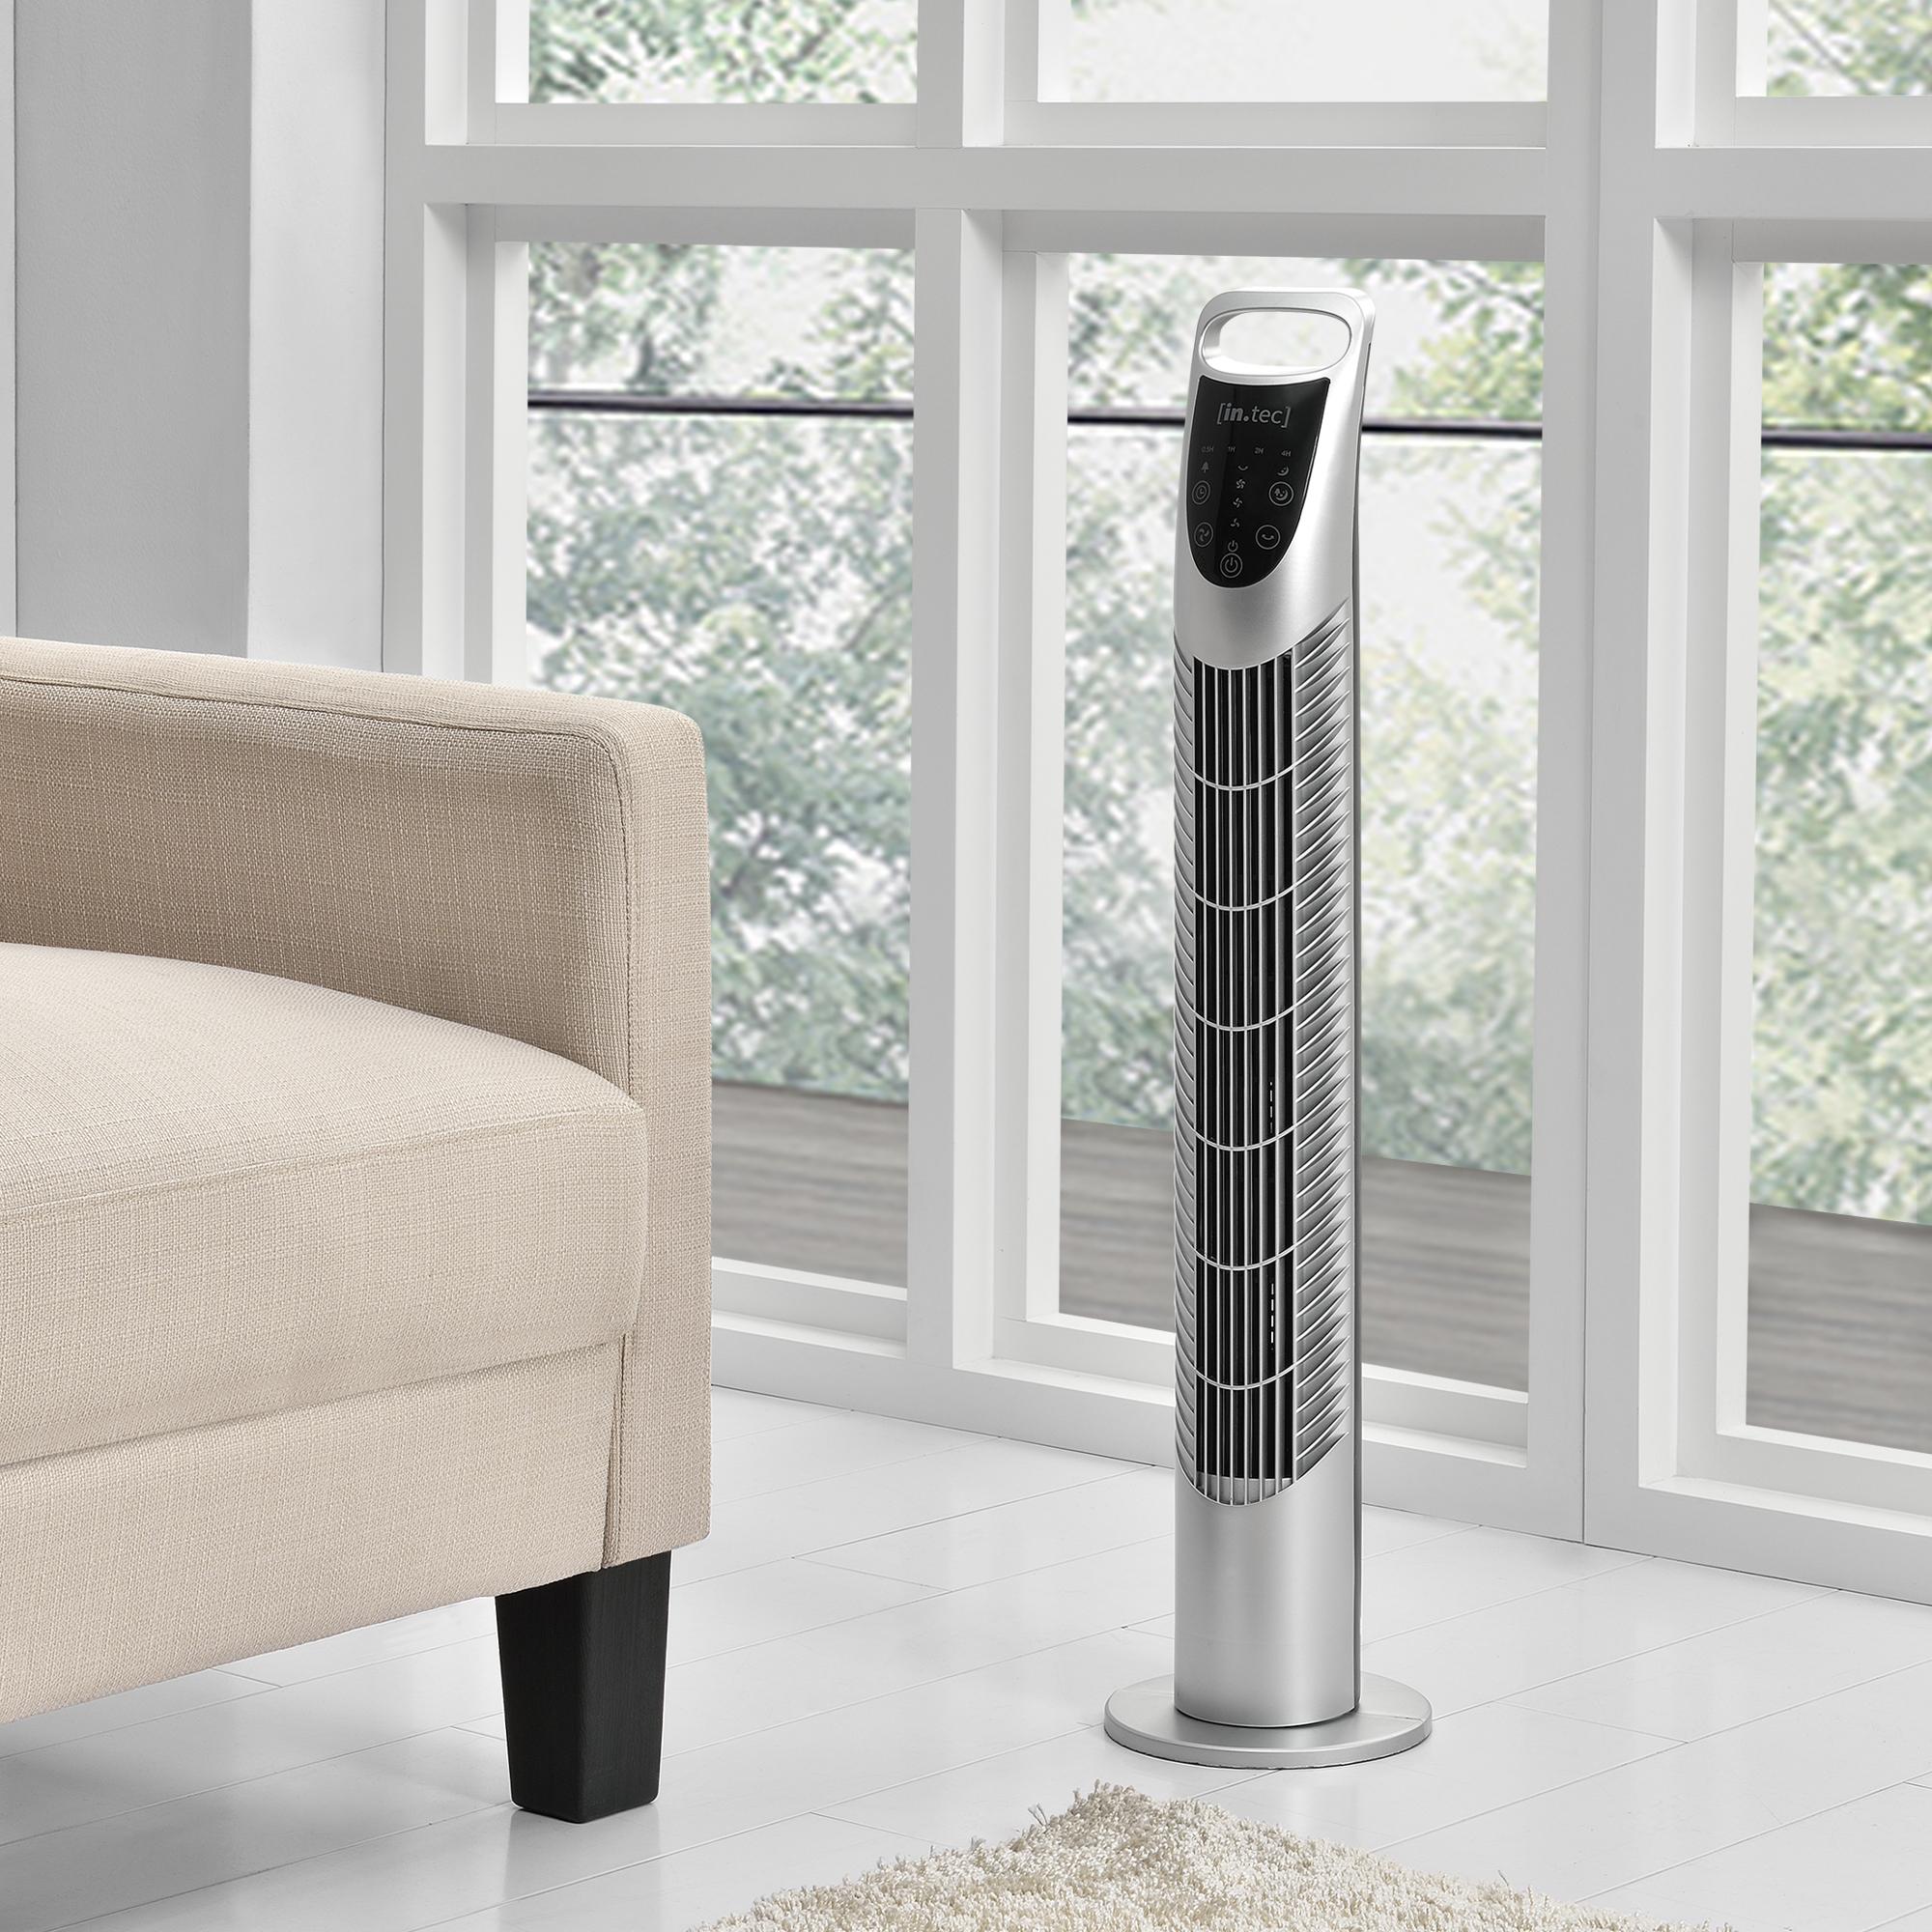 standventilator turmventilator s ulenventilator fernbedienung silber ebay. Black Bedroom Furniture Sets. Home Design Ideas